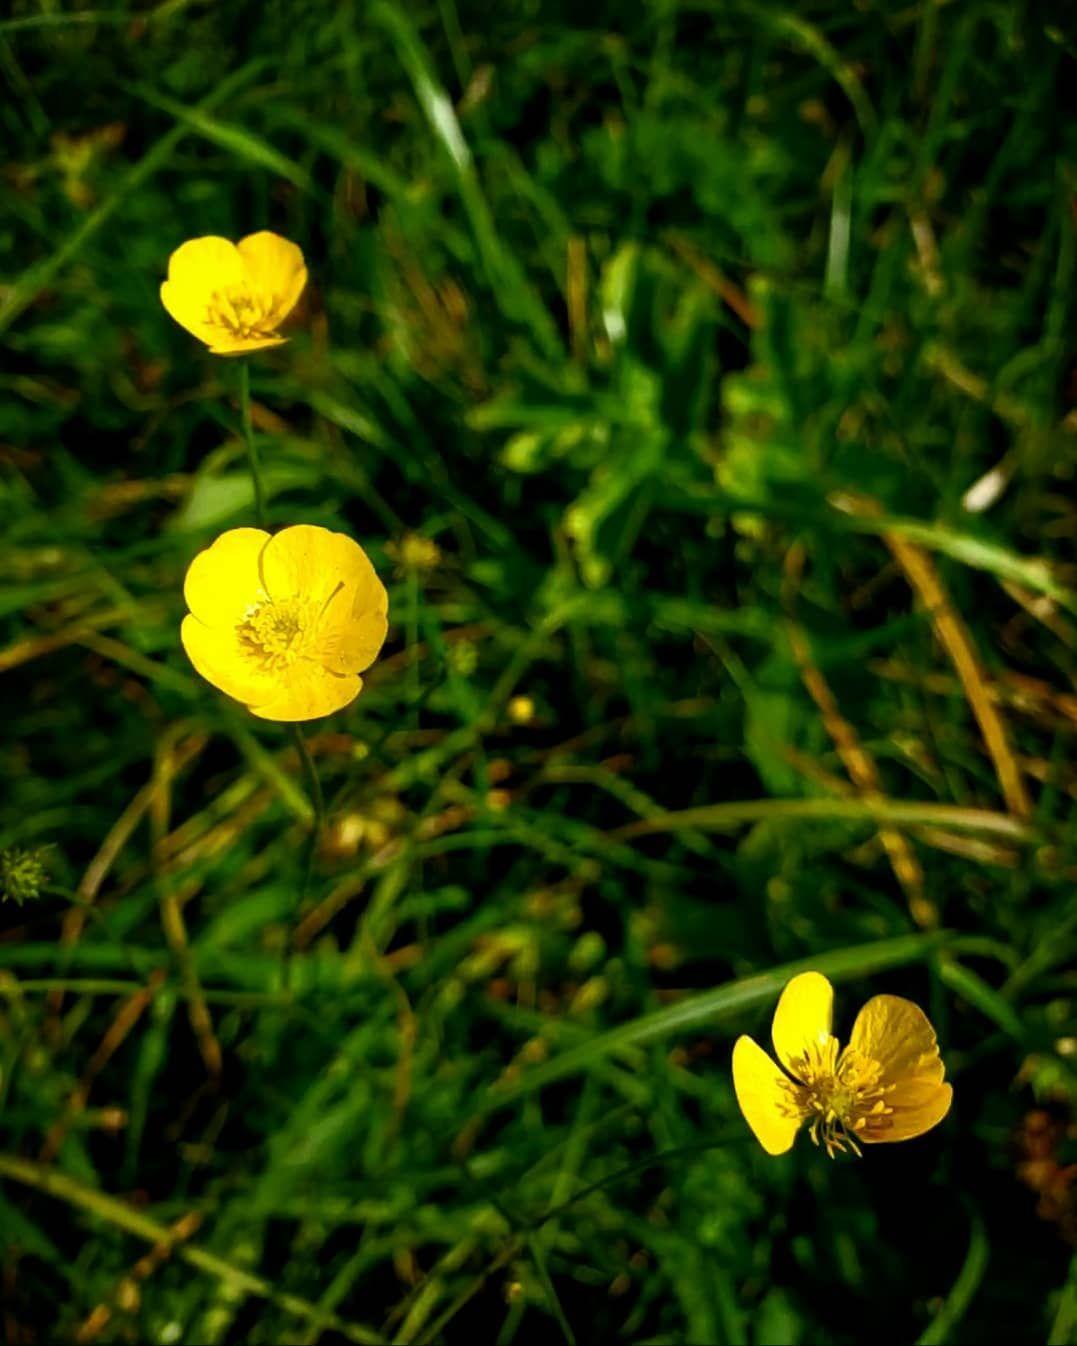 Dacha Time Afternoon Walk On 08 09 20 Ranunculus Acris Westernukraine Sun Ranunc In 2020 Countryside Photography Fields Photography Yellow Flowers